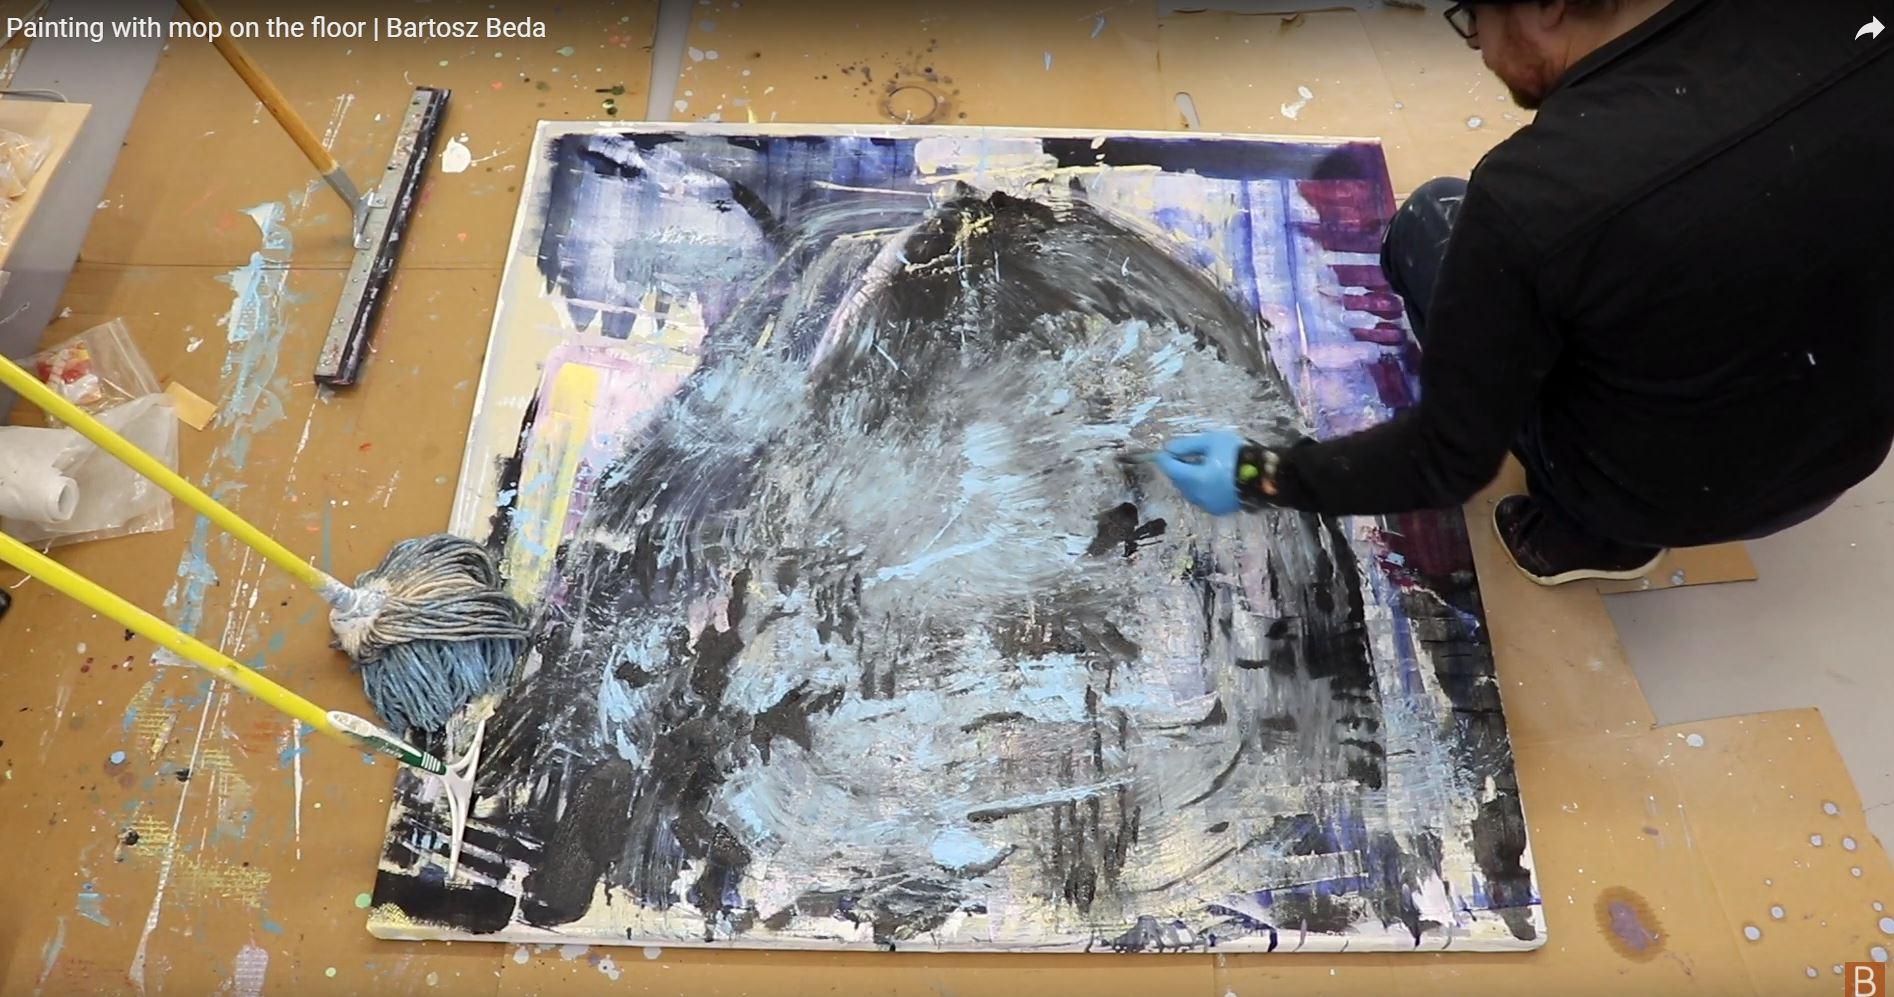 bartosz beda, dallas, tx, paintings 3